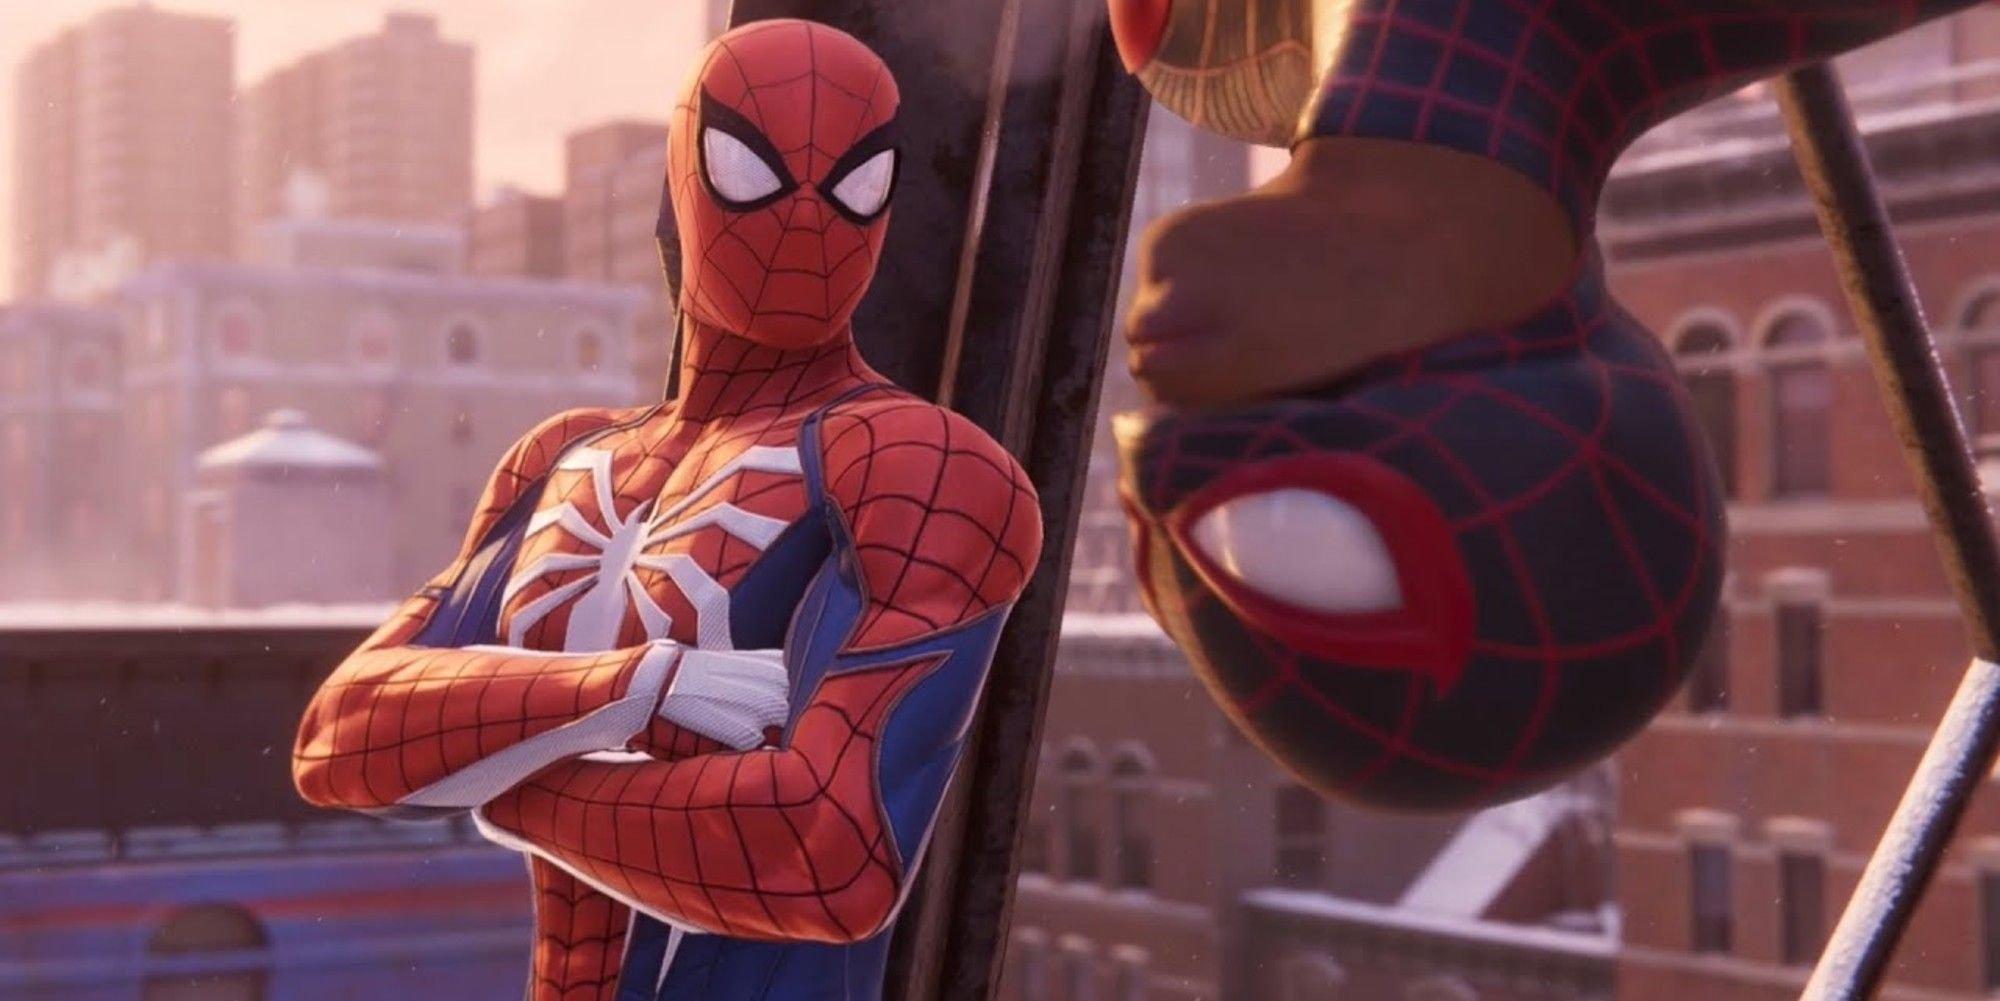 Miles Morales Post Fuels Spider-Man 2 Speculation